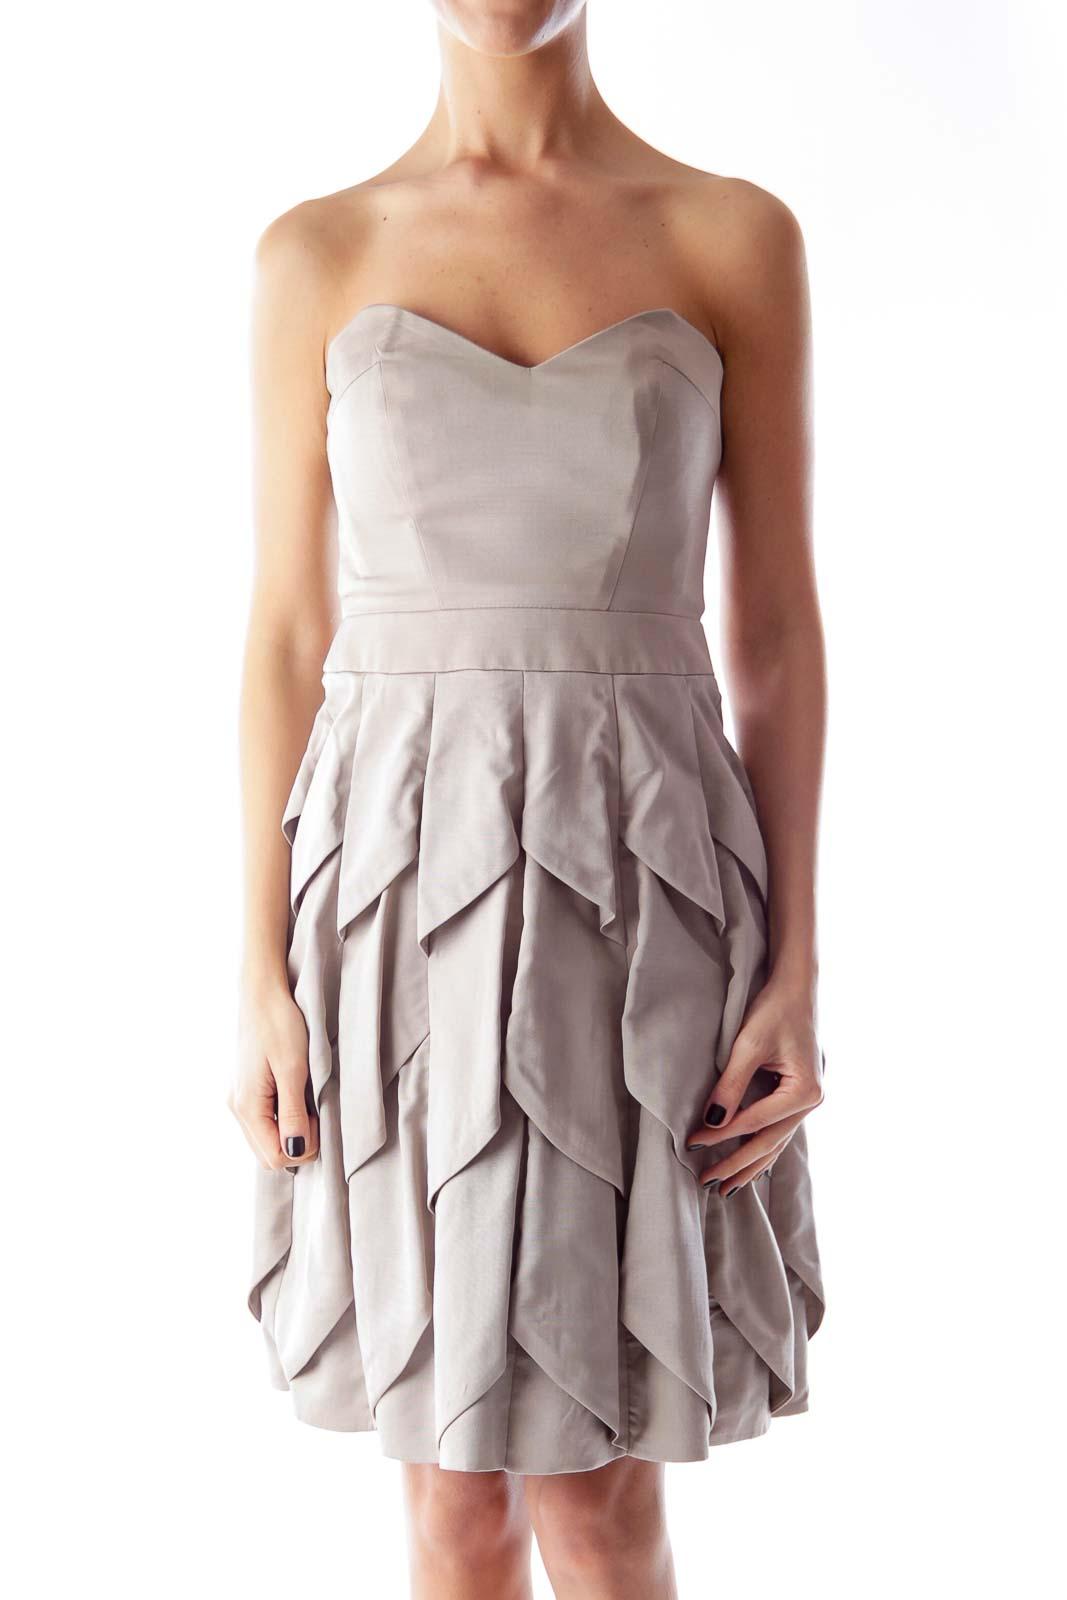 Beige Strapless Layer Dress Front